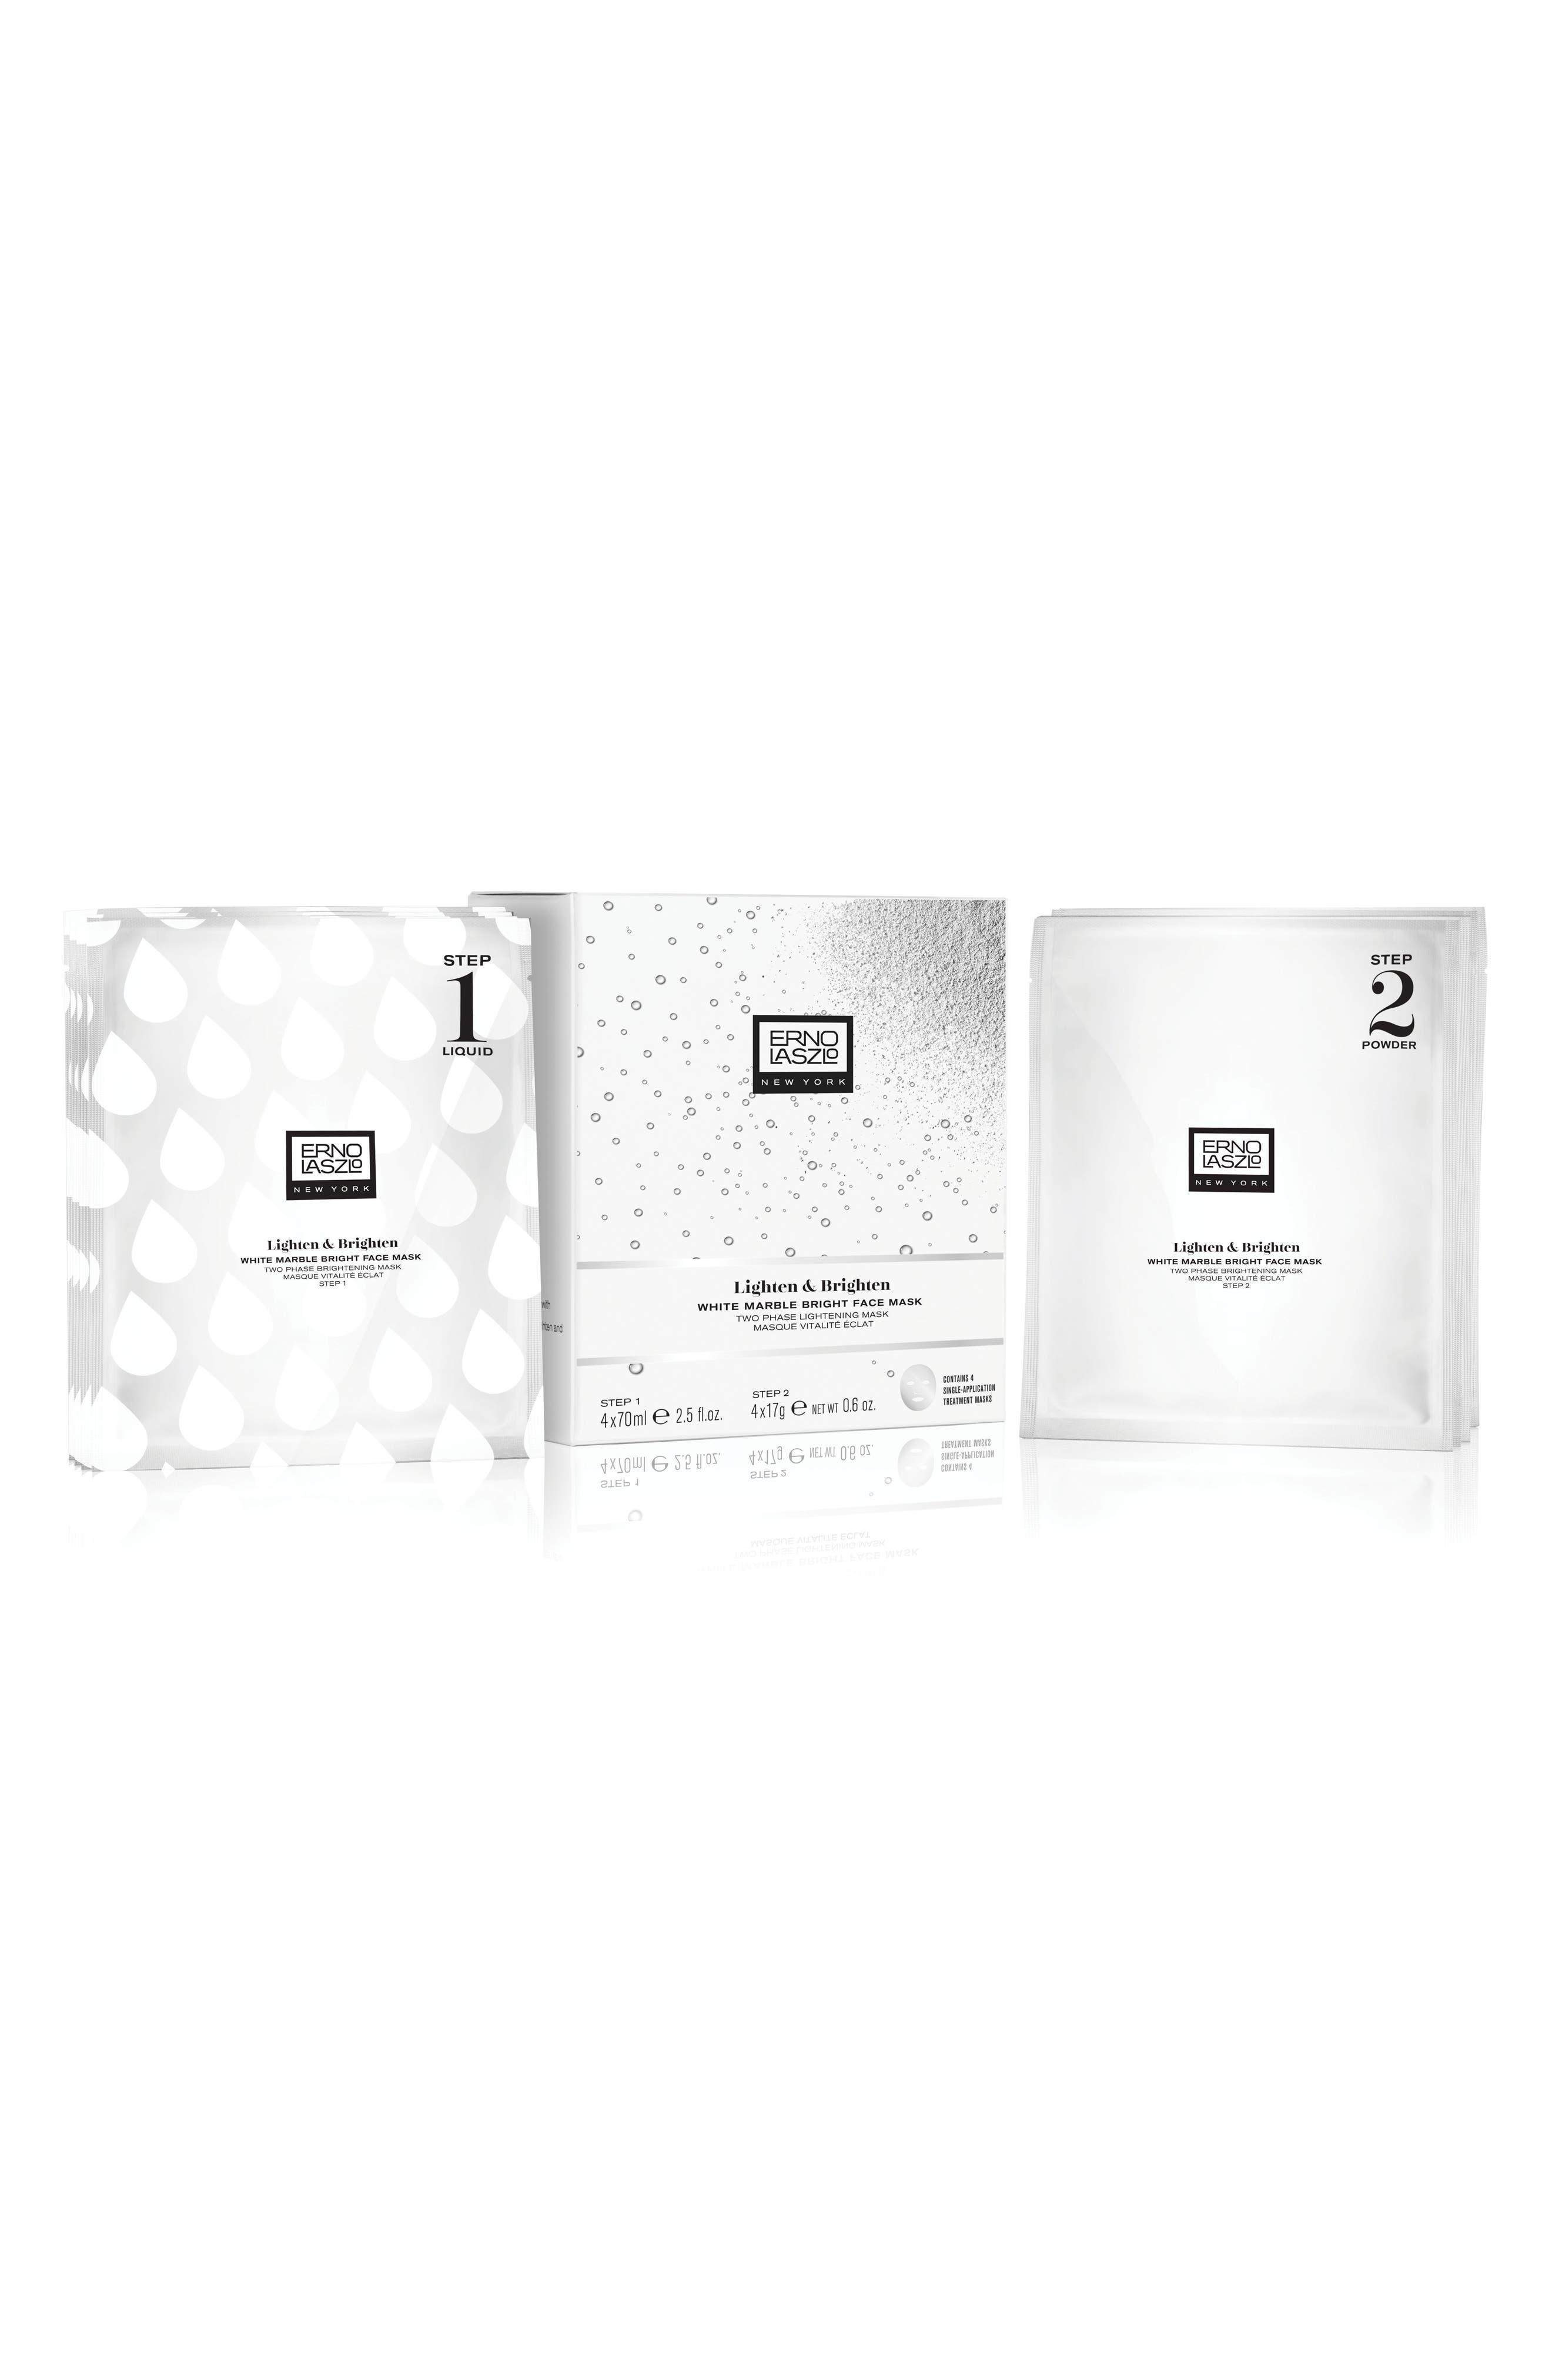 Alternate Image 1 Selected - Erno Laszlo Lighten & Brighten White Marble Brightening Face Mask